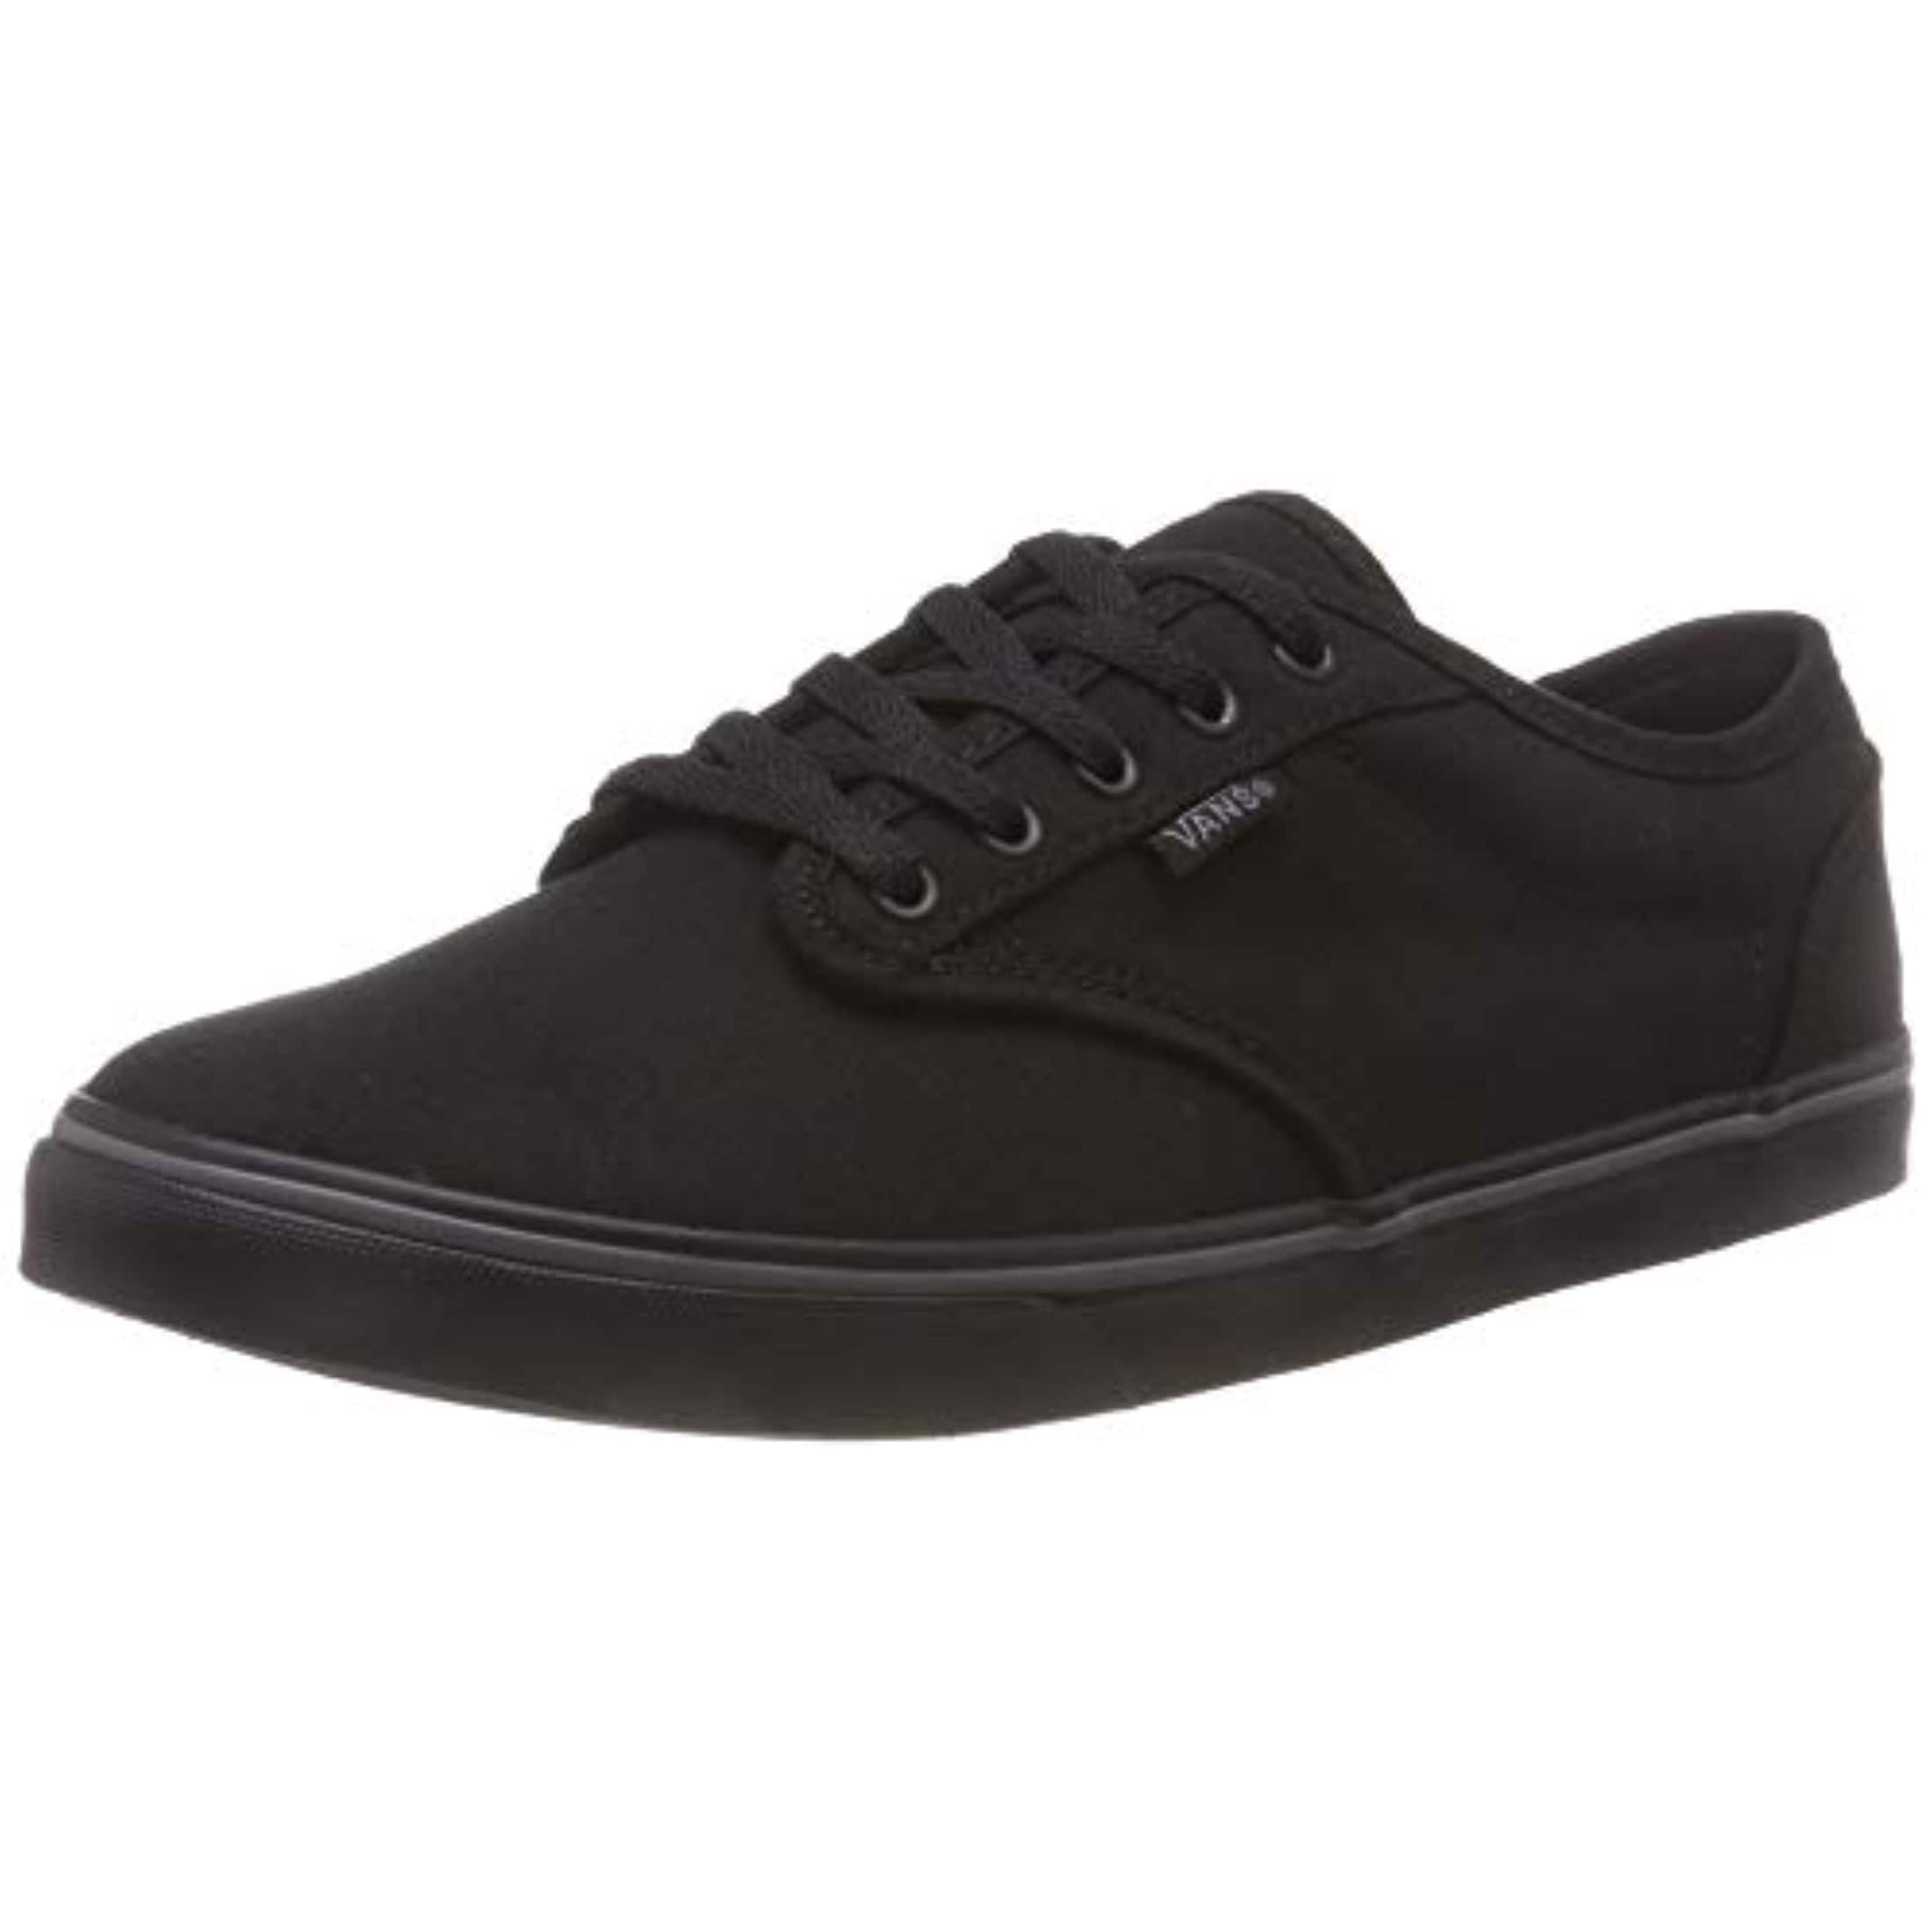 ac22ecaec07152 Shop Vans Atwood Low Valcanised Skate